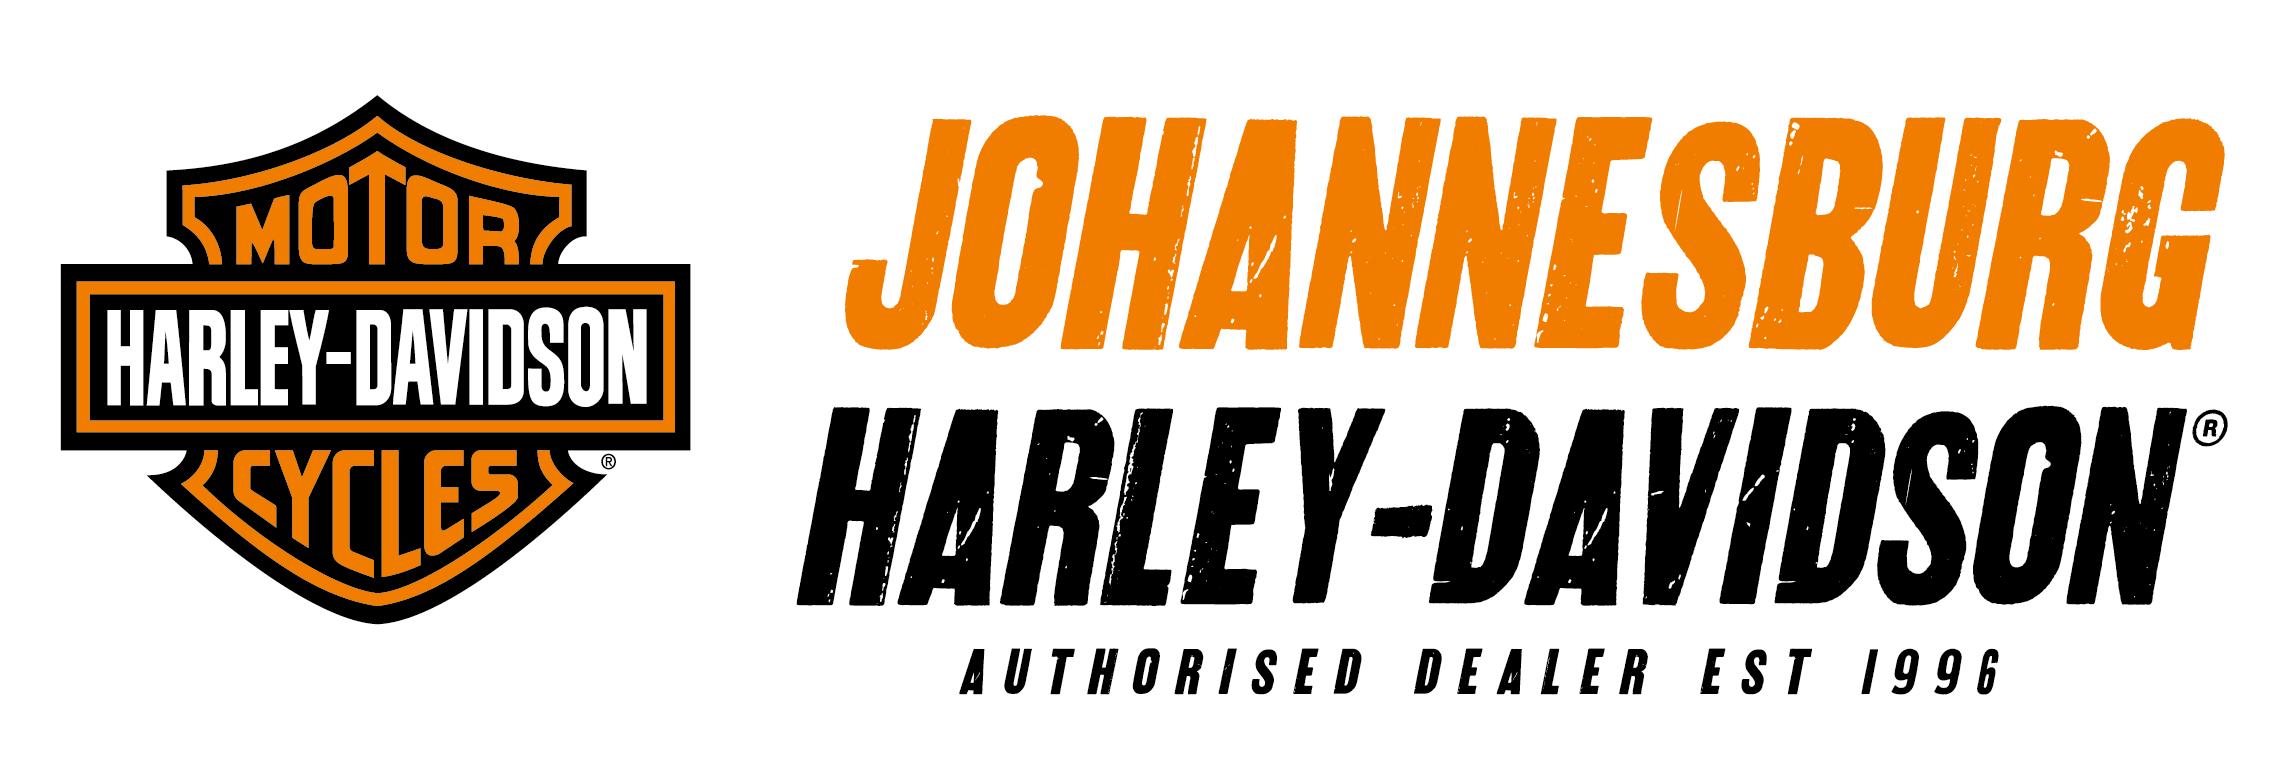 Johannesburg Harley-Davidson<sup>&reg;</sup>